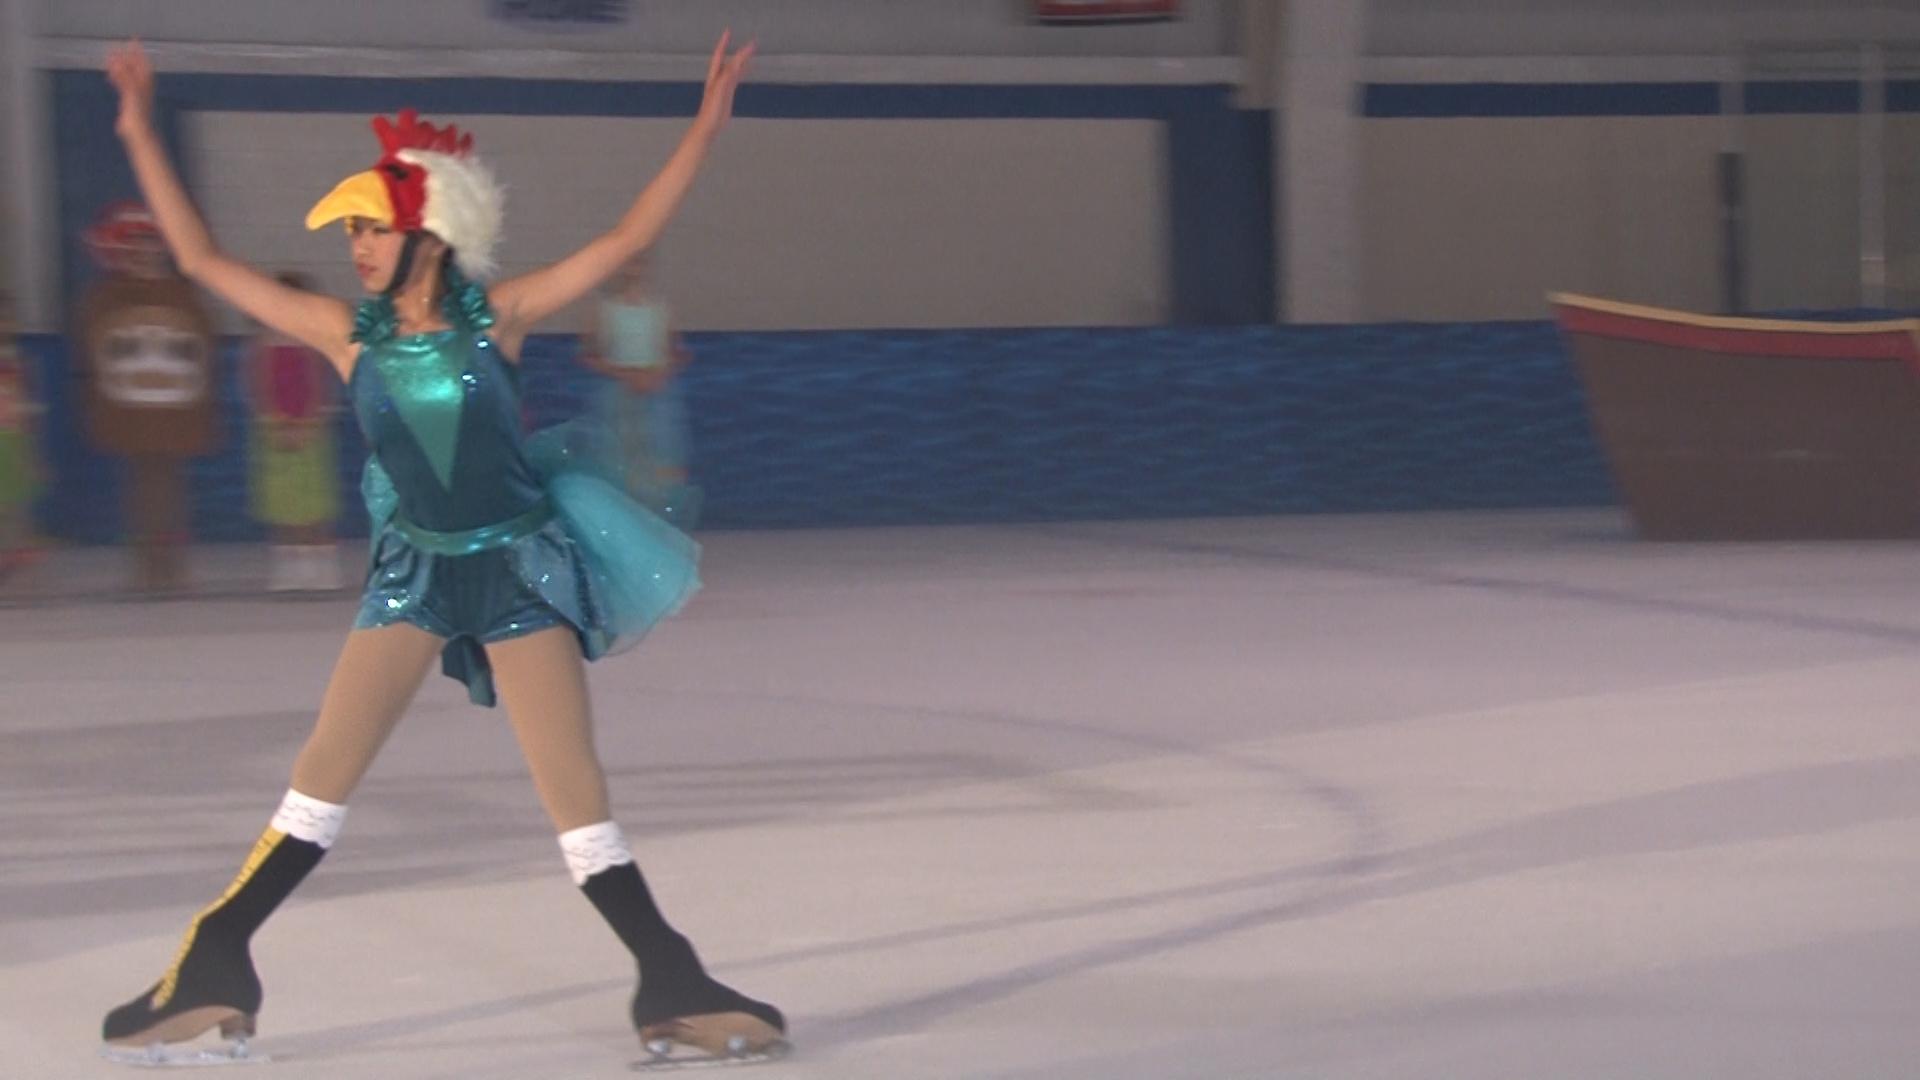 Power Play Maui Skate on Ice 071417.01_00_50_27.Still103.jpg